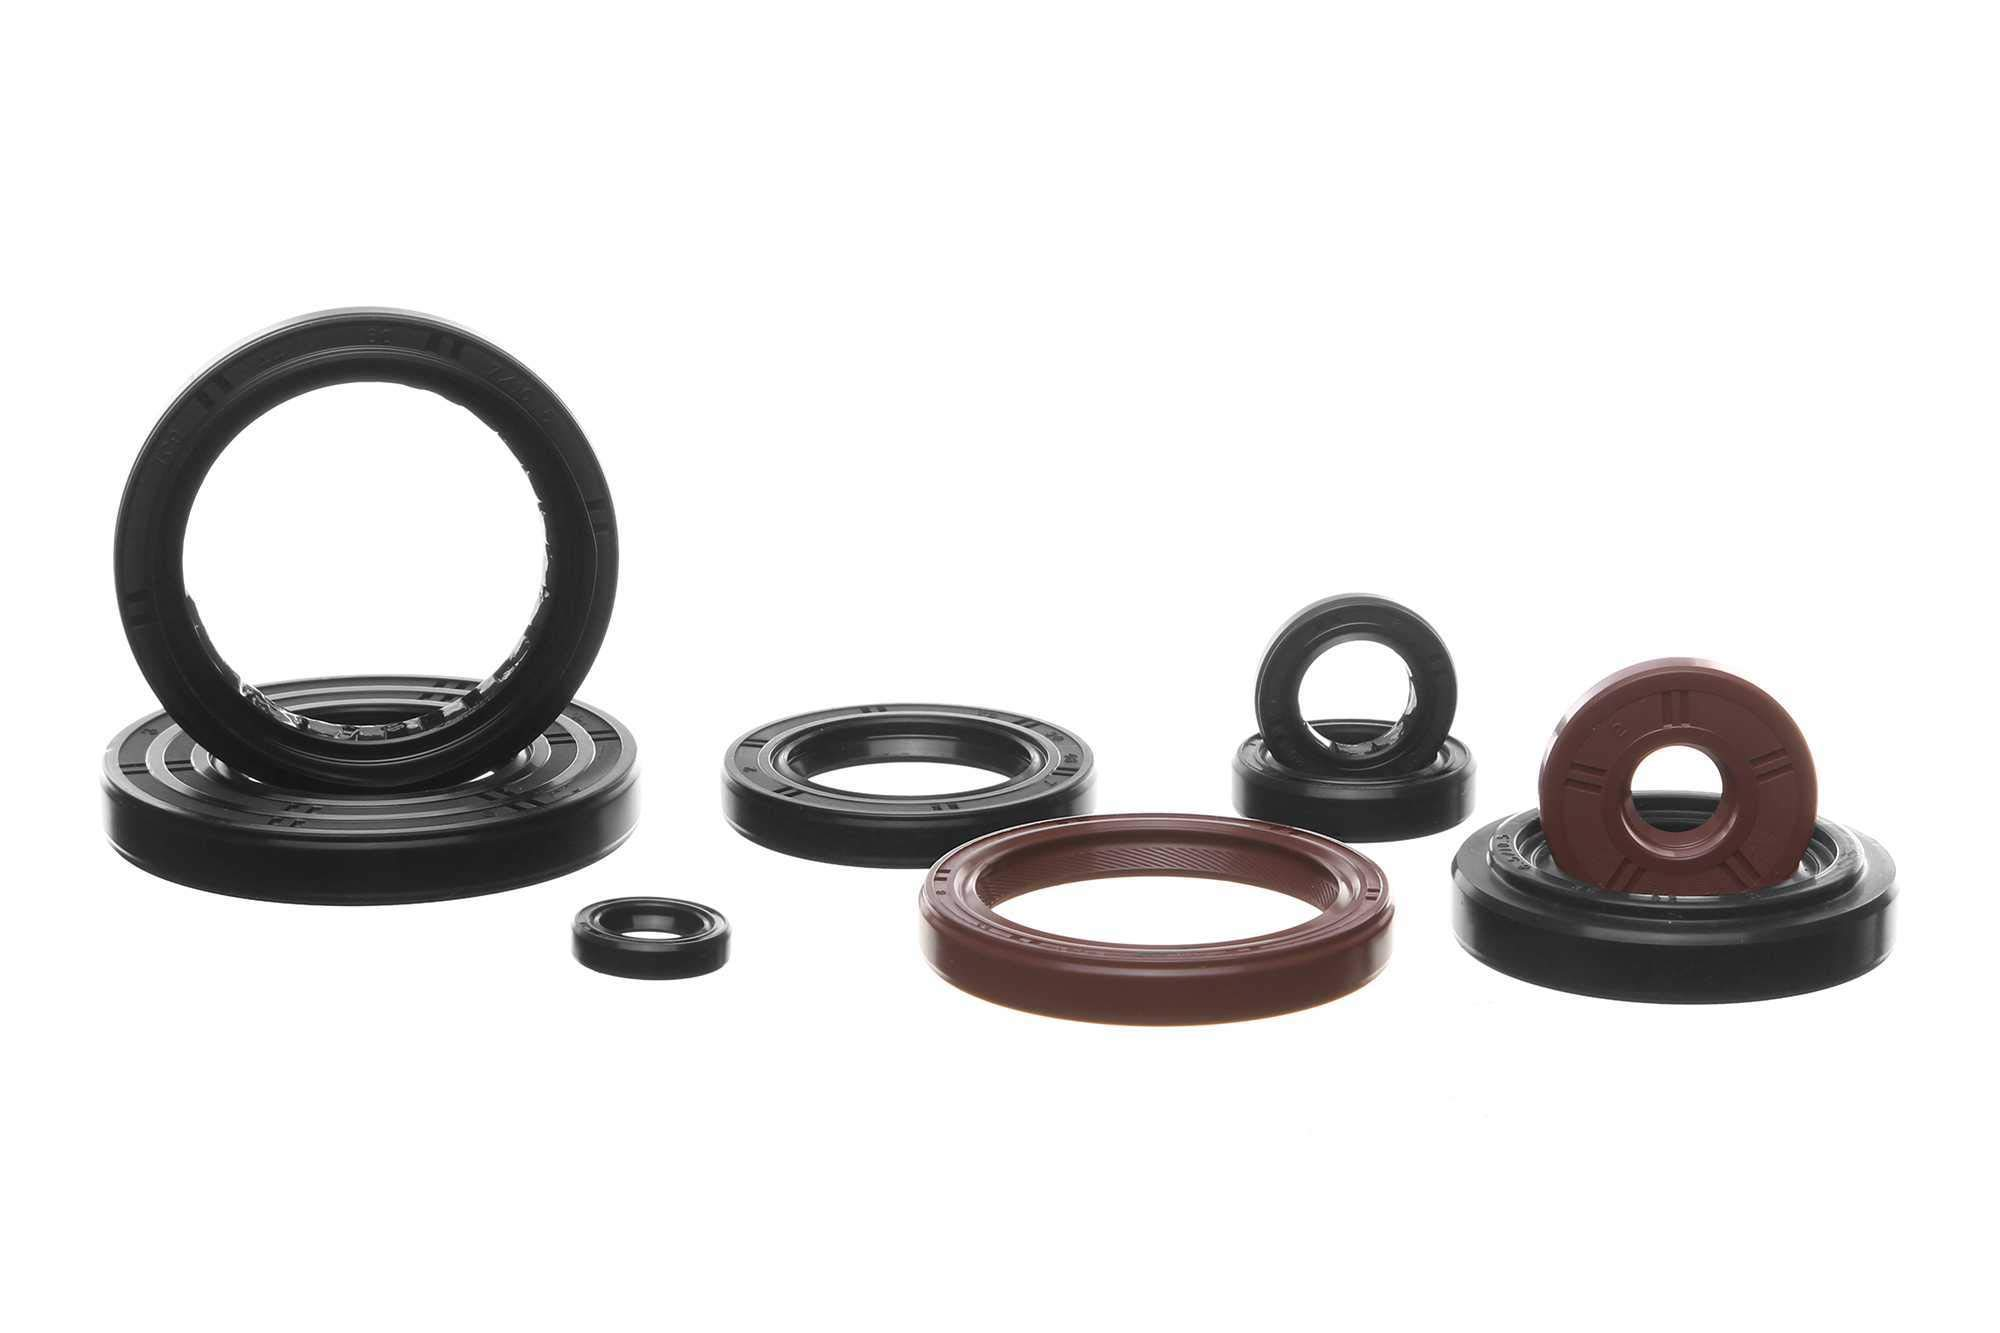 REPLACEMENTKITS.COM - Complete Oil Seal Engine Kit fits HiSun Massimo SUPERMACH Bennche MSU Coleman Cub Cadet & Qlink UTV's - by REPLACEMENTKITS.COM